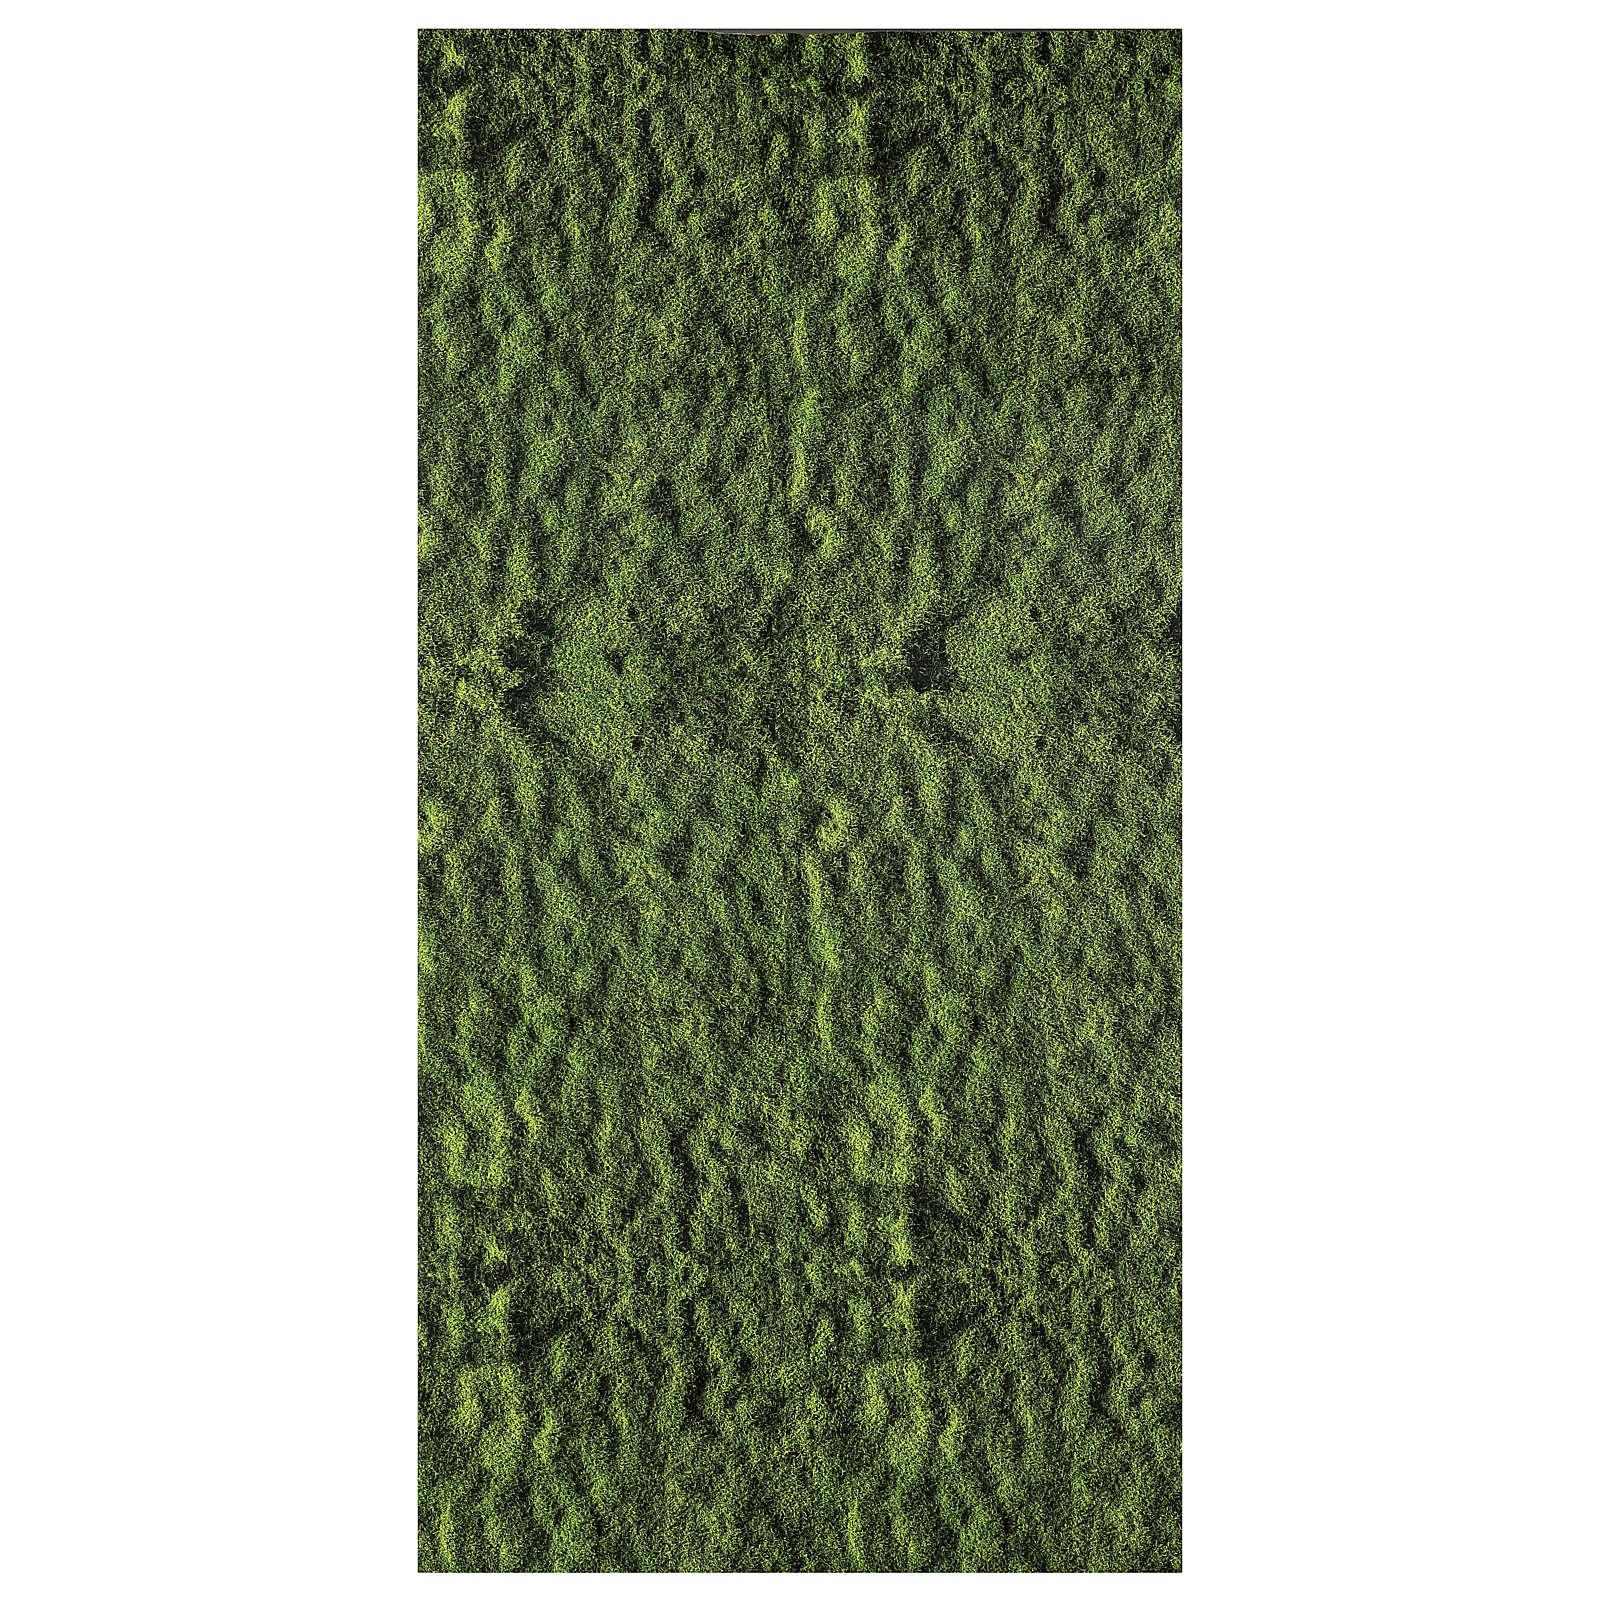 Nativity backdrop moss paper 120x60 cm 4